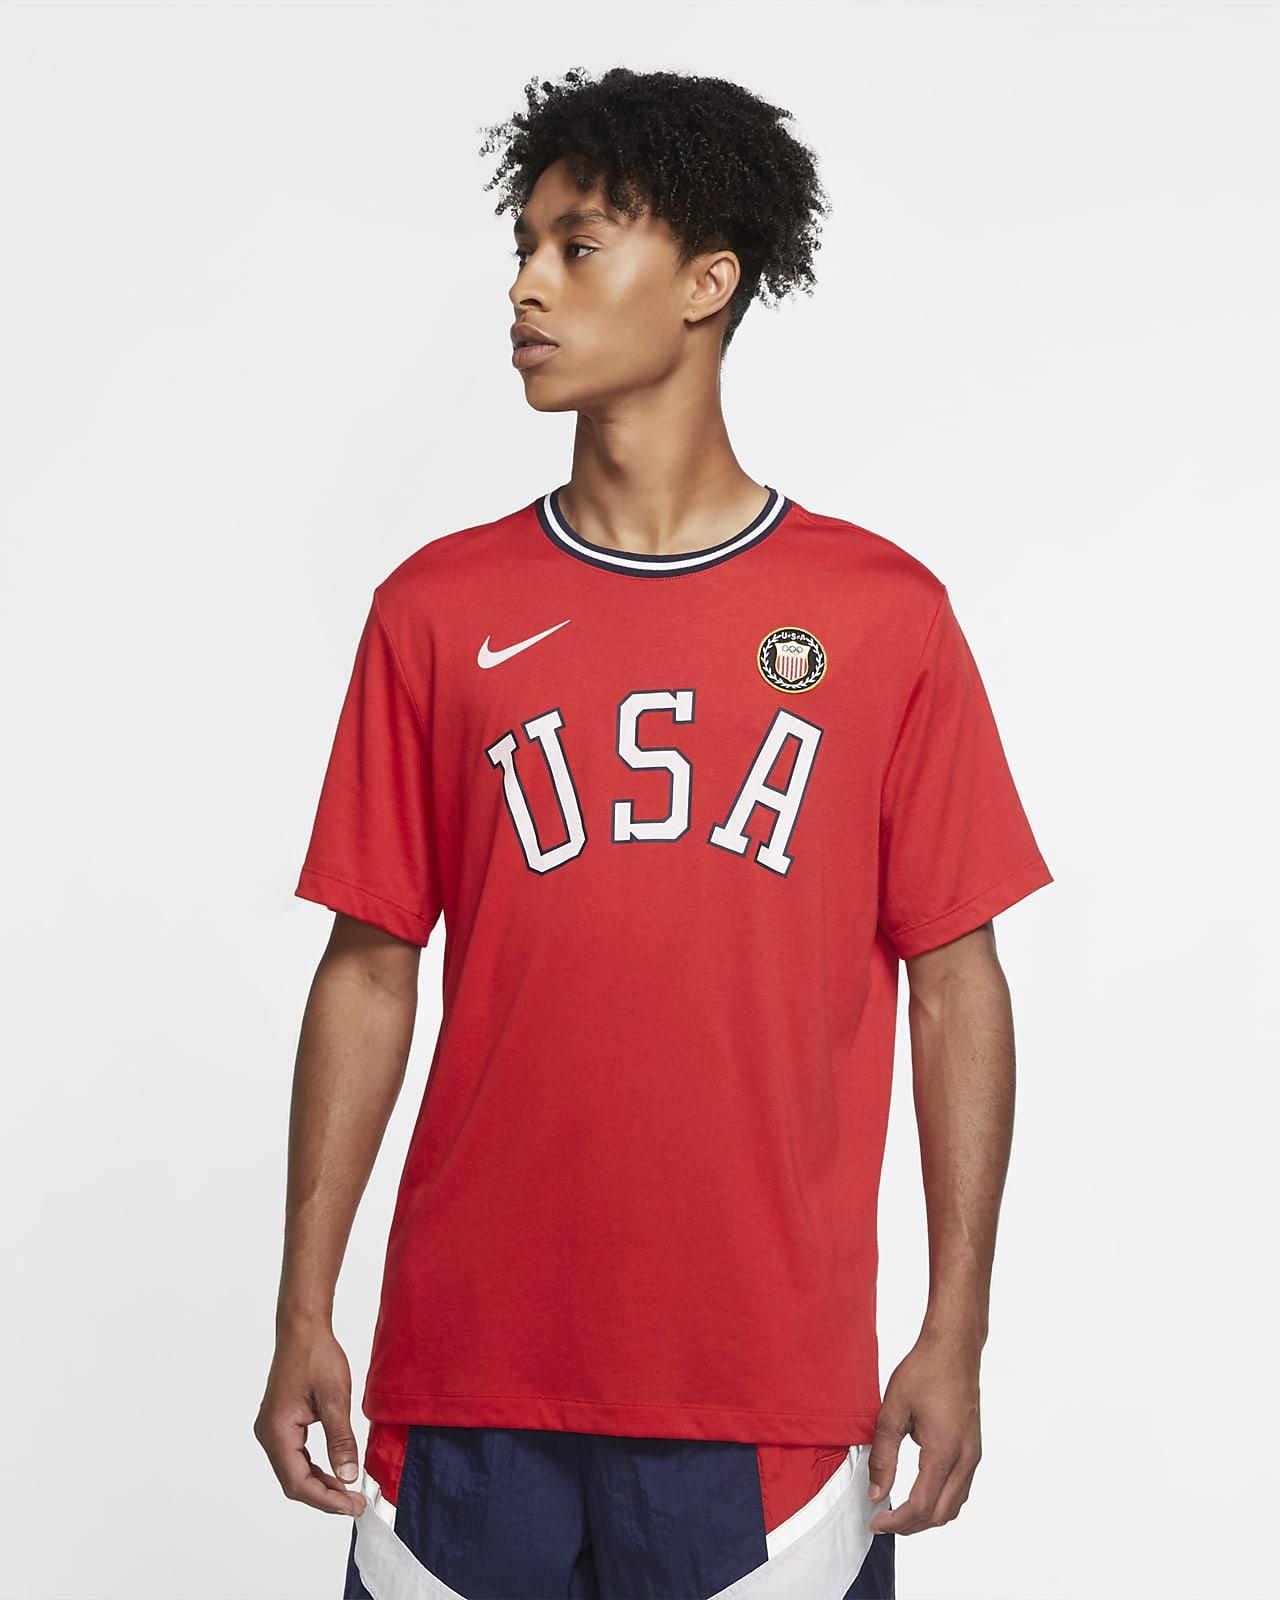 Nike Sportswear Team USA Men's T-Shirt